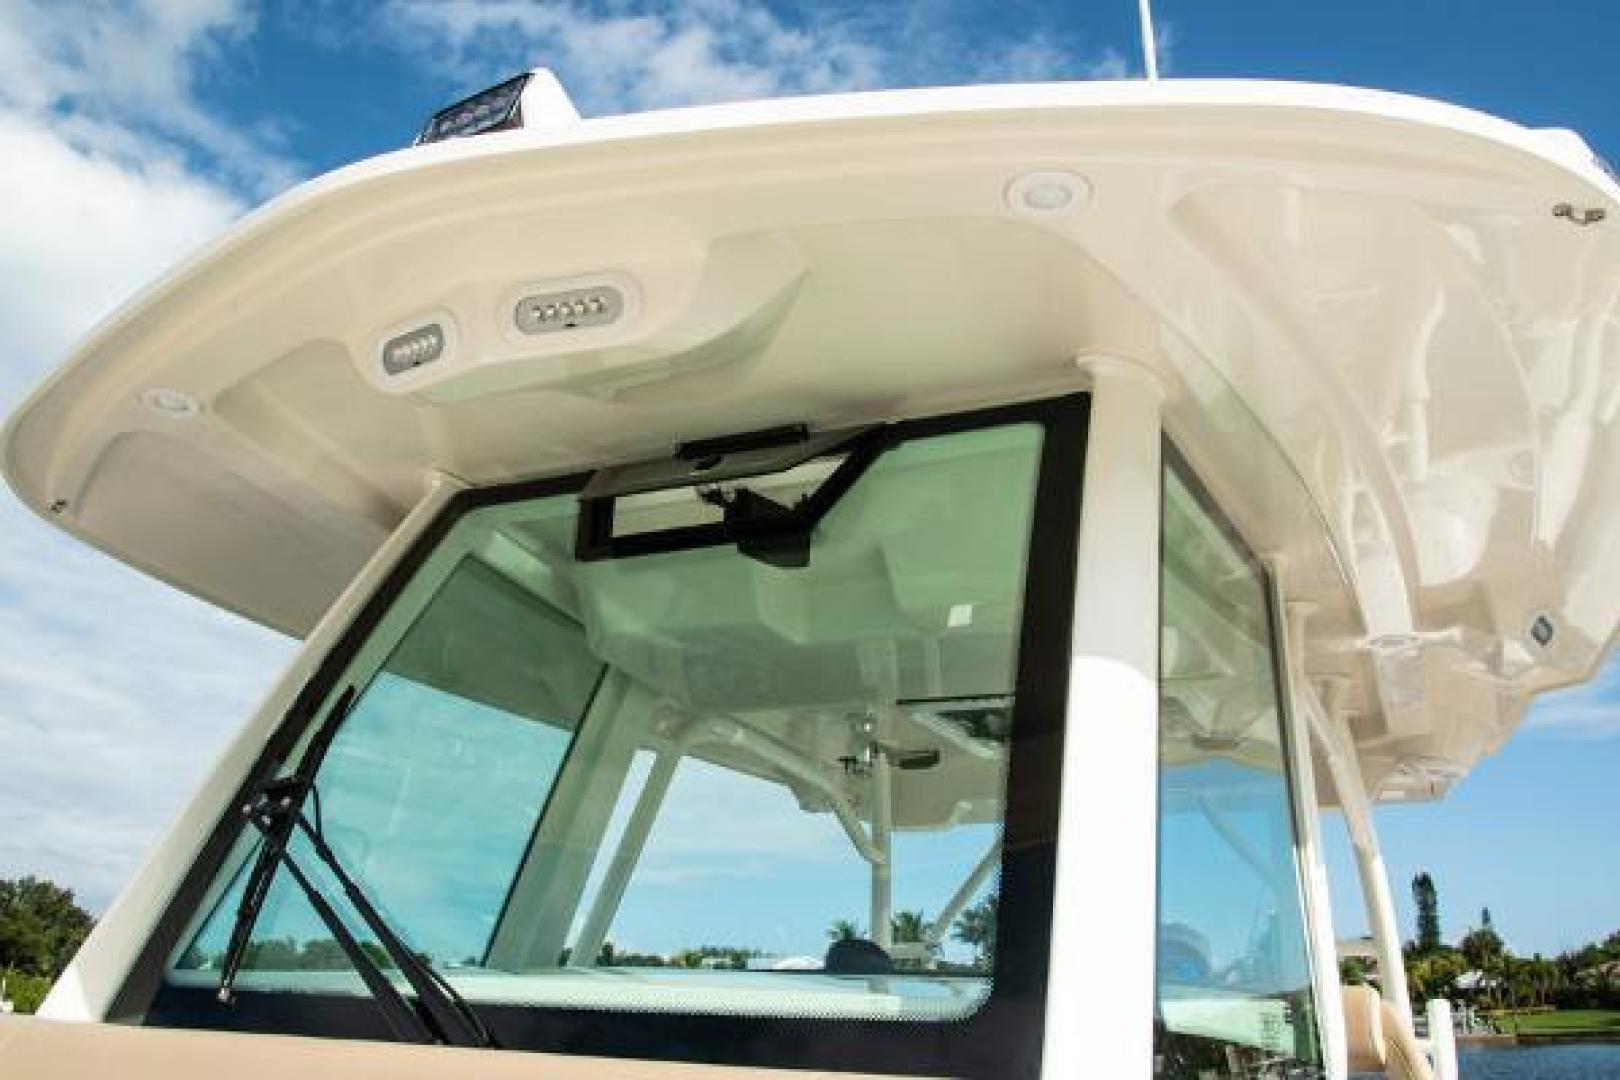 Sailfish-360 CC 2021-Sailfish 360 CC Fort Lauderdale-Florida-United States-Manufacturer Provided Image-1524508 | Thumbnail